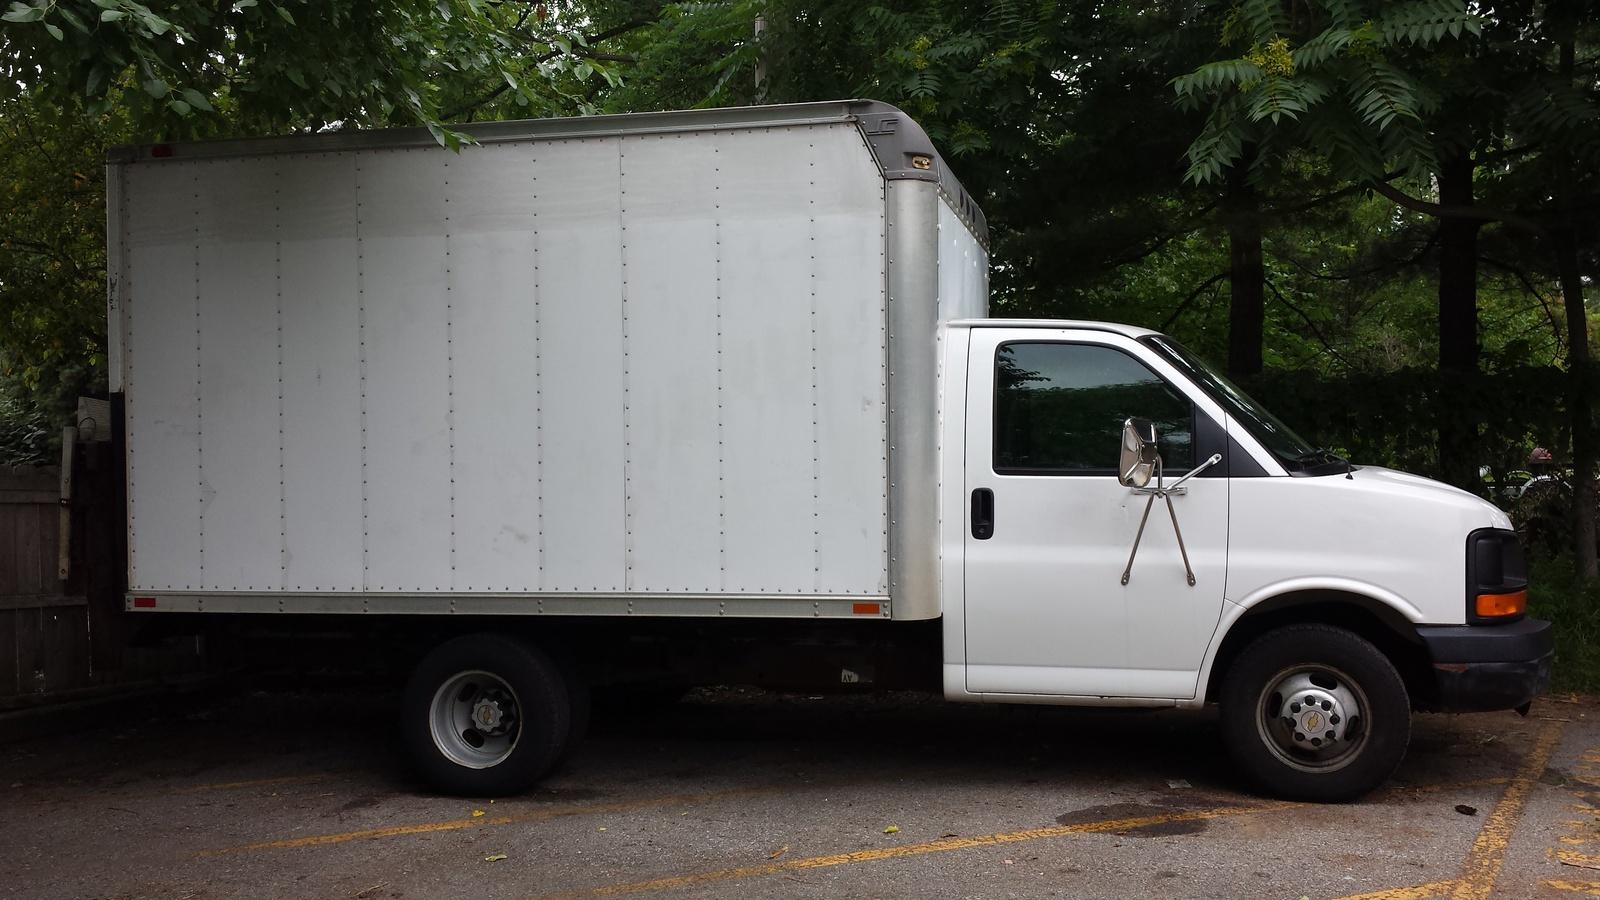 Picture of 2004 Chevrolet Express Cargo 3 Dr G3500 Cargo Van